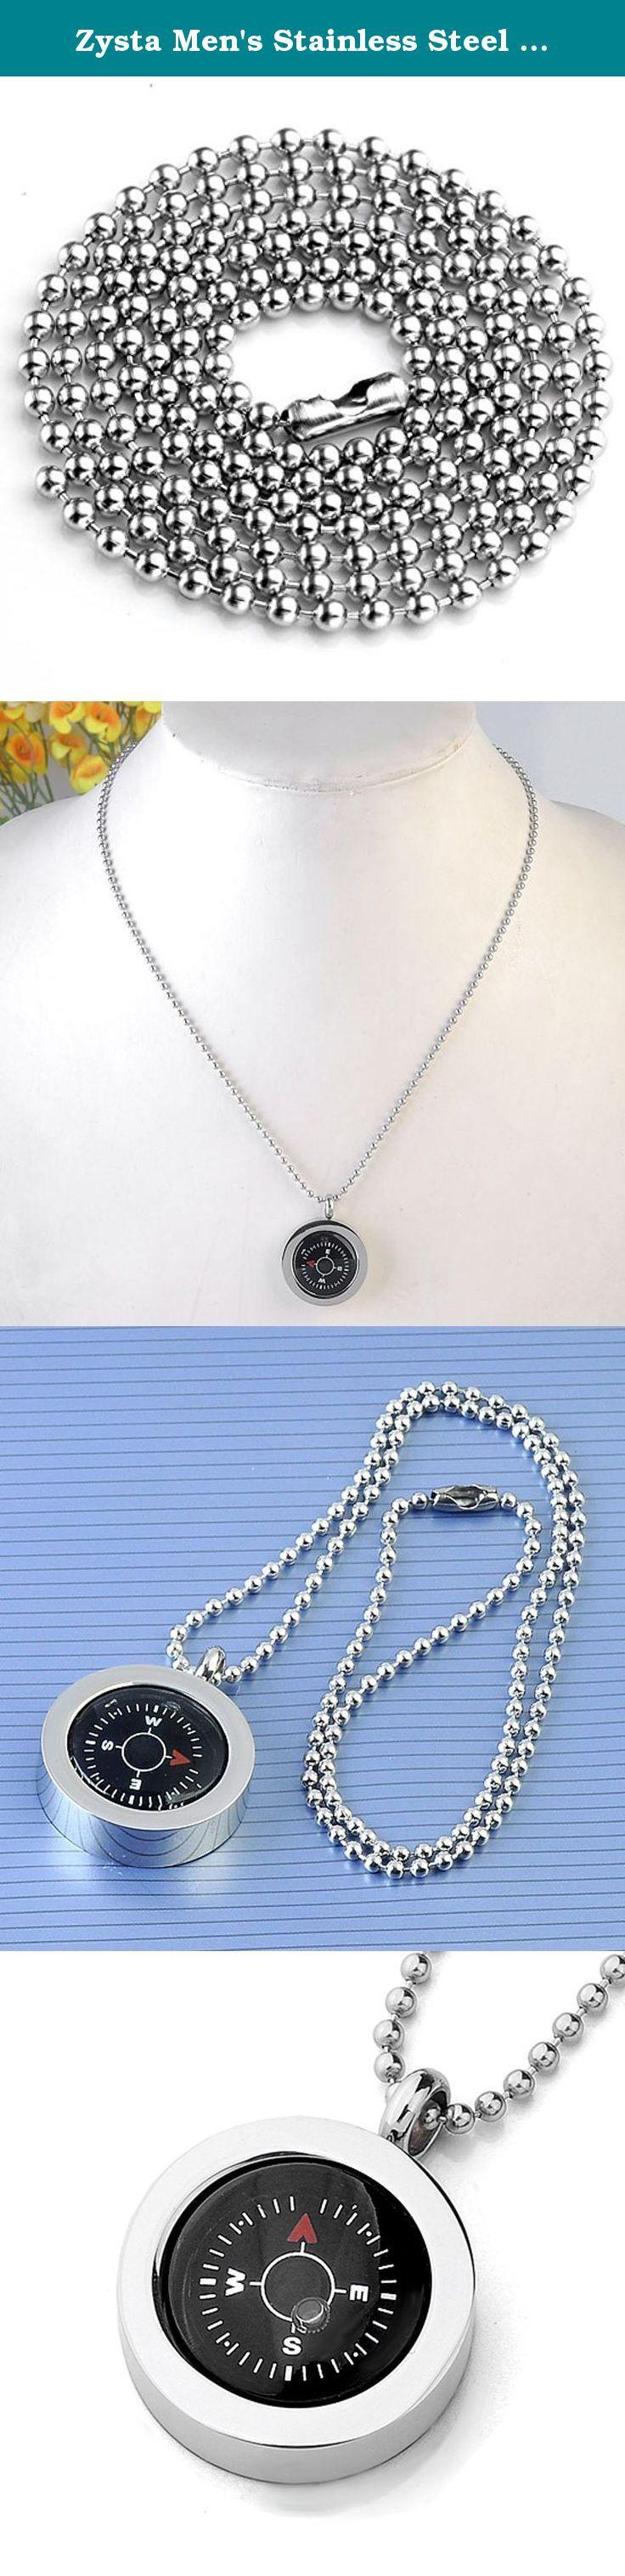 Zysta Men's Stainless Steel Pendant Necklace - With 20 Inches Chain (Compass). Stainless Steel Pendant and Stainless Steel Bead Chain. Zysta Men's Stainless Steel Pendant Necklace - With 20 Inches Chain (Compass). Pendant Size:27*34*9MM. Chain Length: 19 Inches.